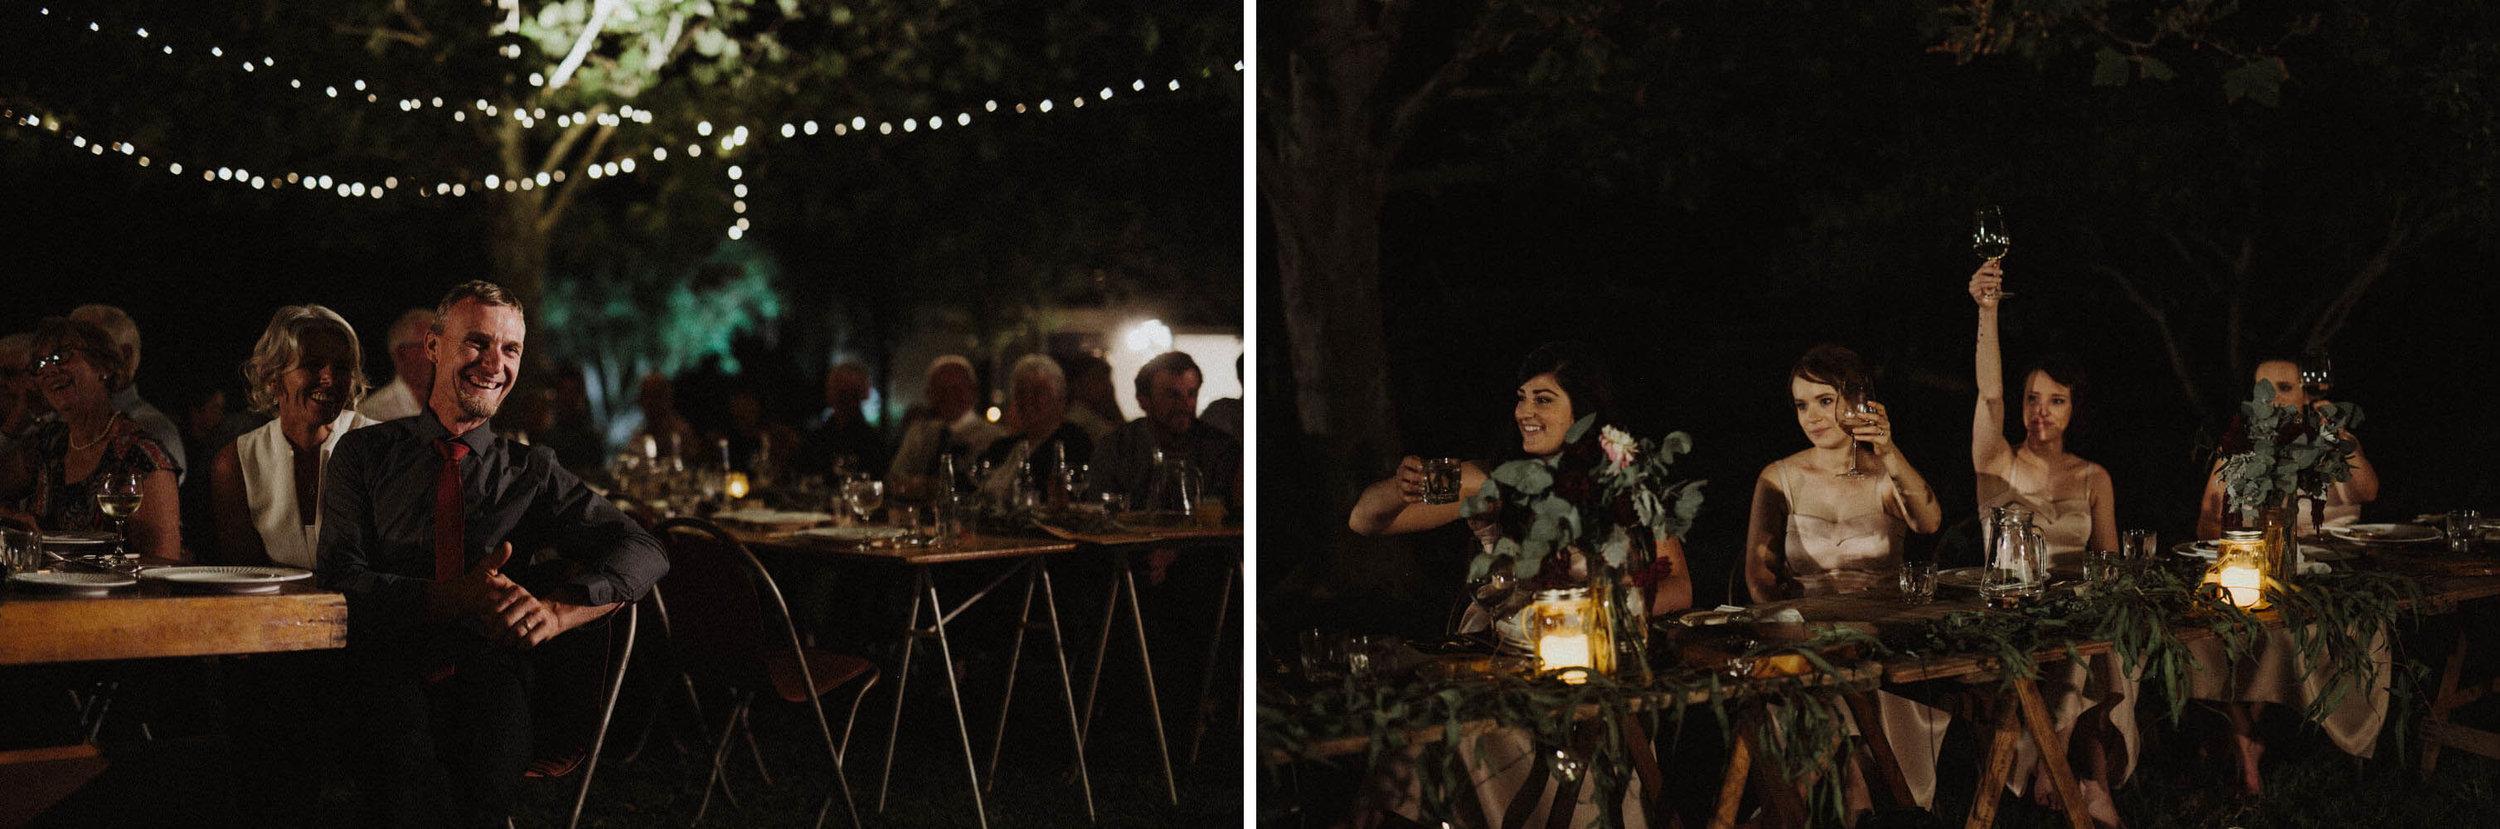 australian-wedding-photography_225(4298)2.jpg